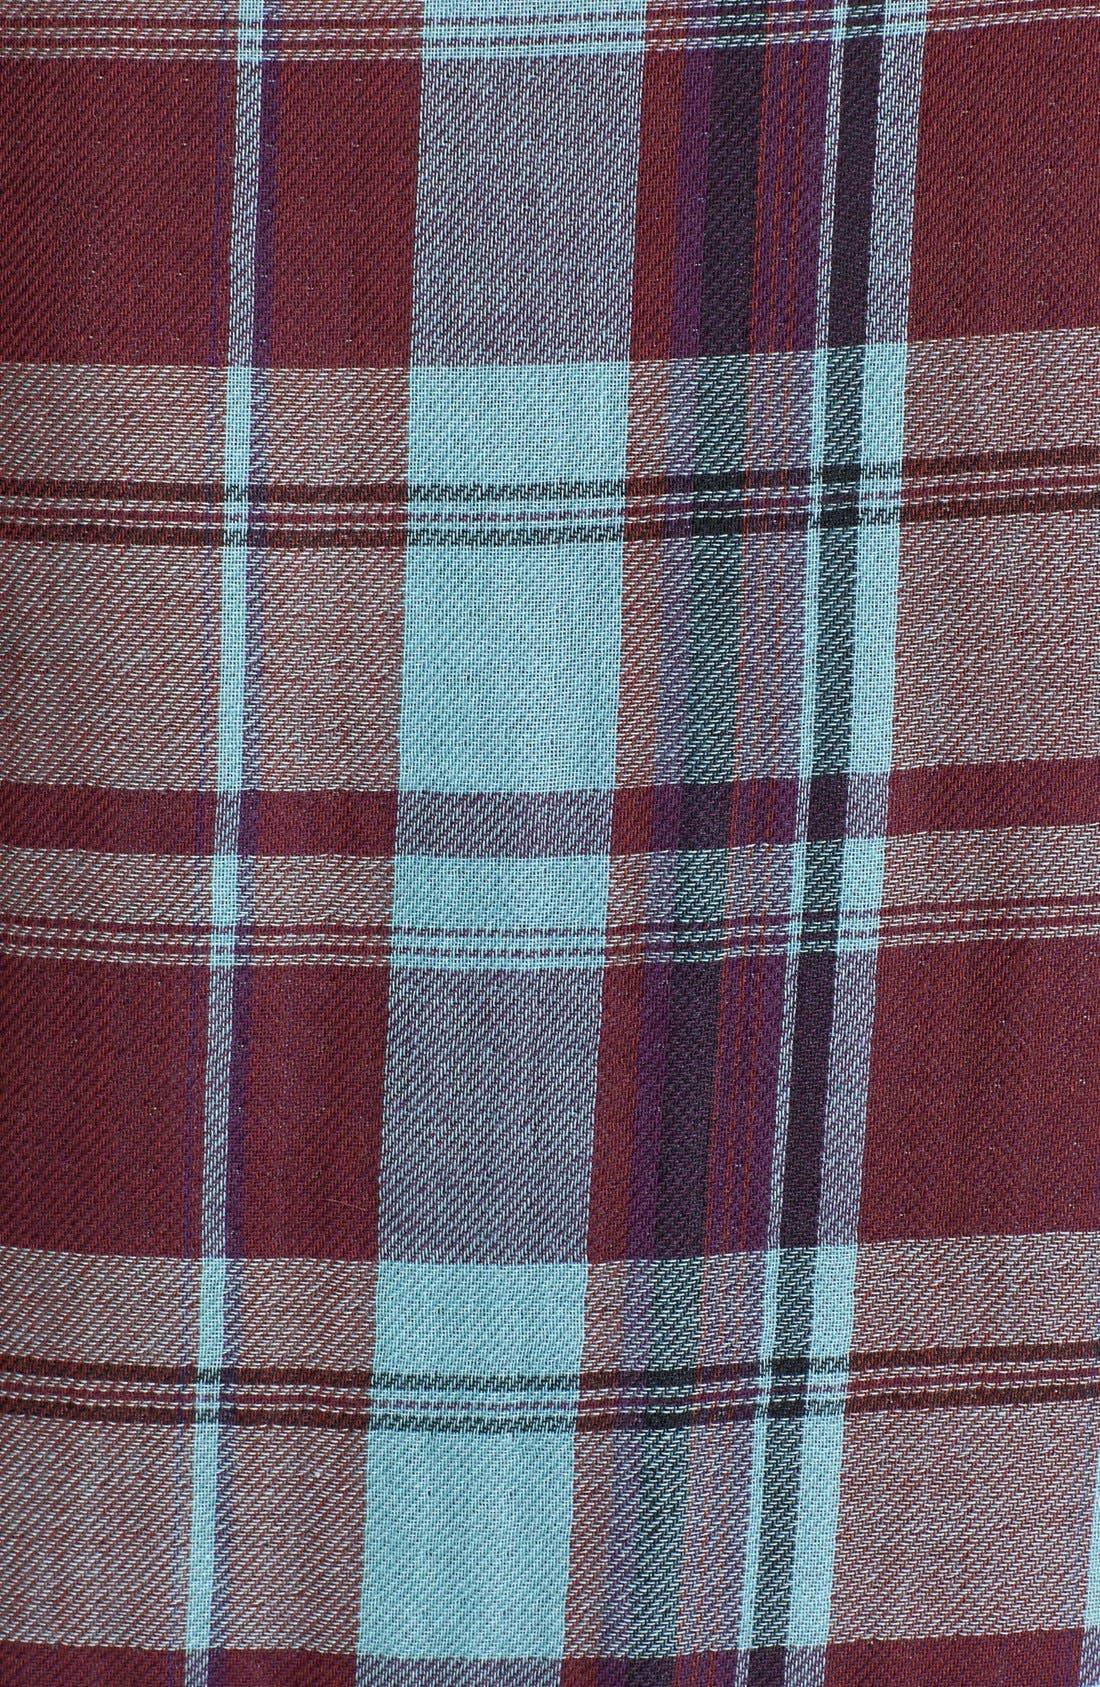 Denim 'Kadie' Plaid Shirt,                             Alternate thumbnail 3, color,                             Smitten